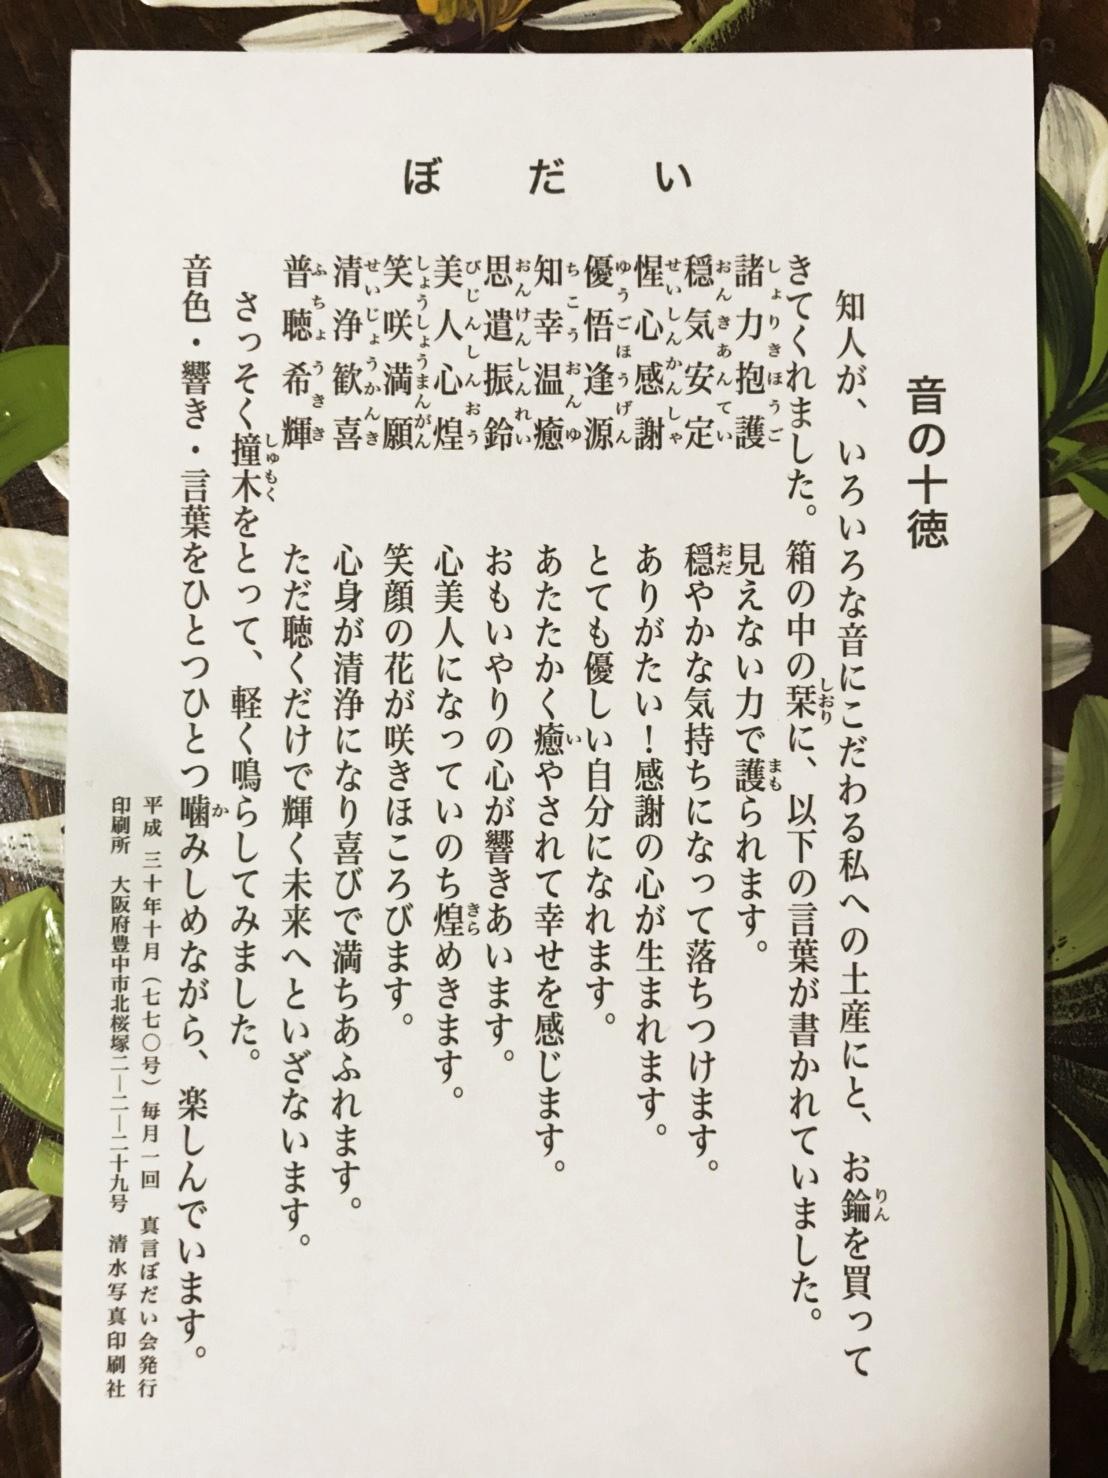 S__198975493.jpg